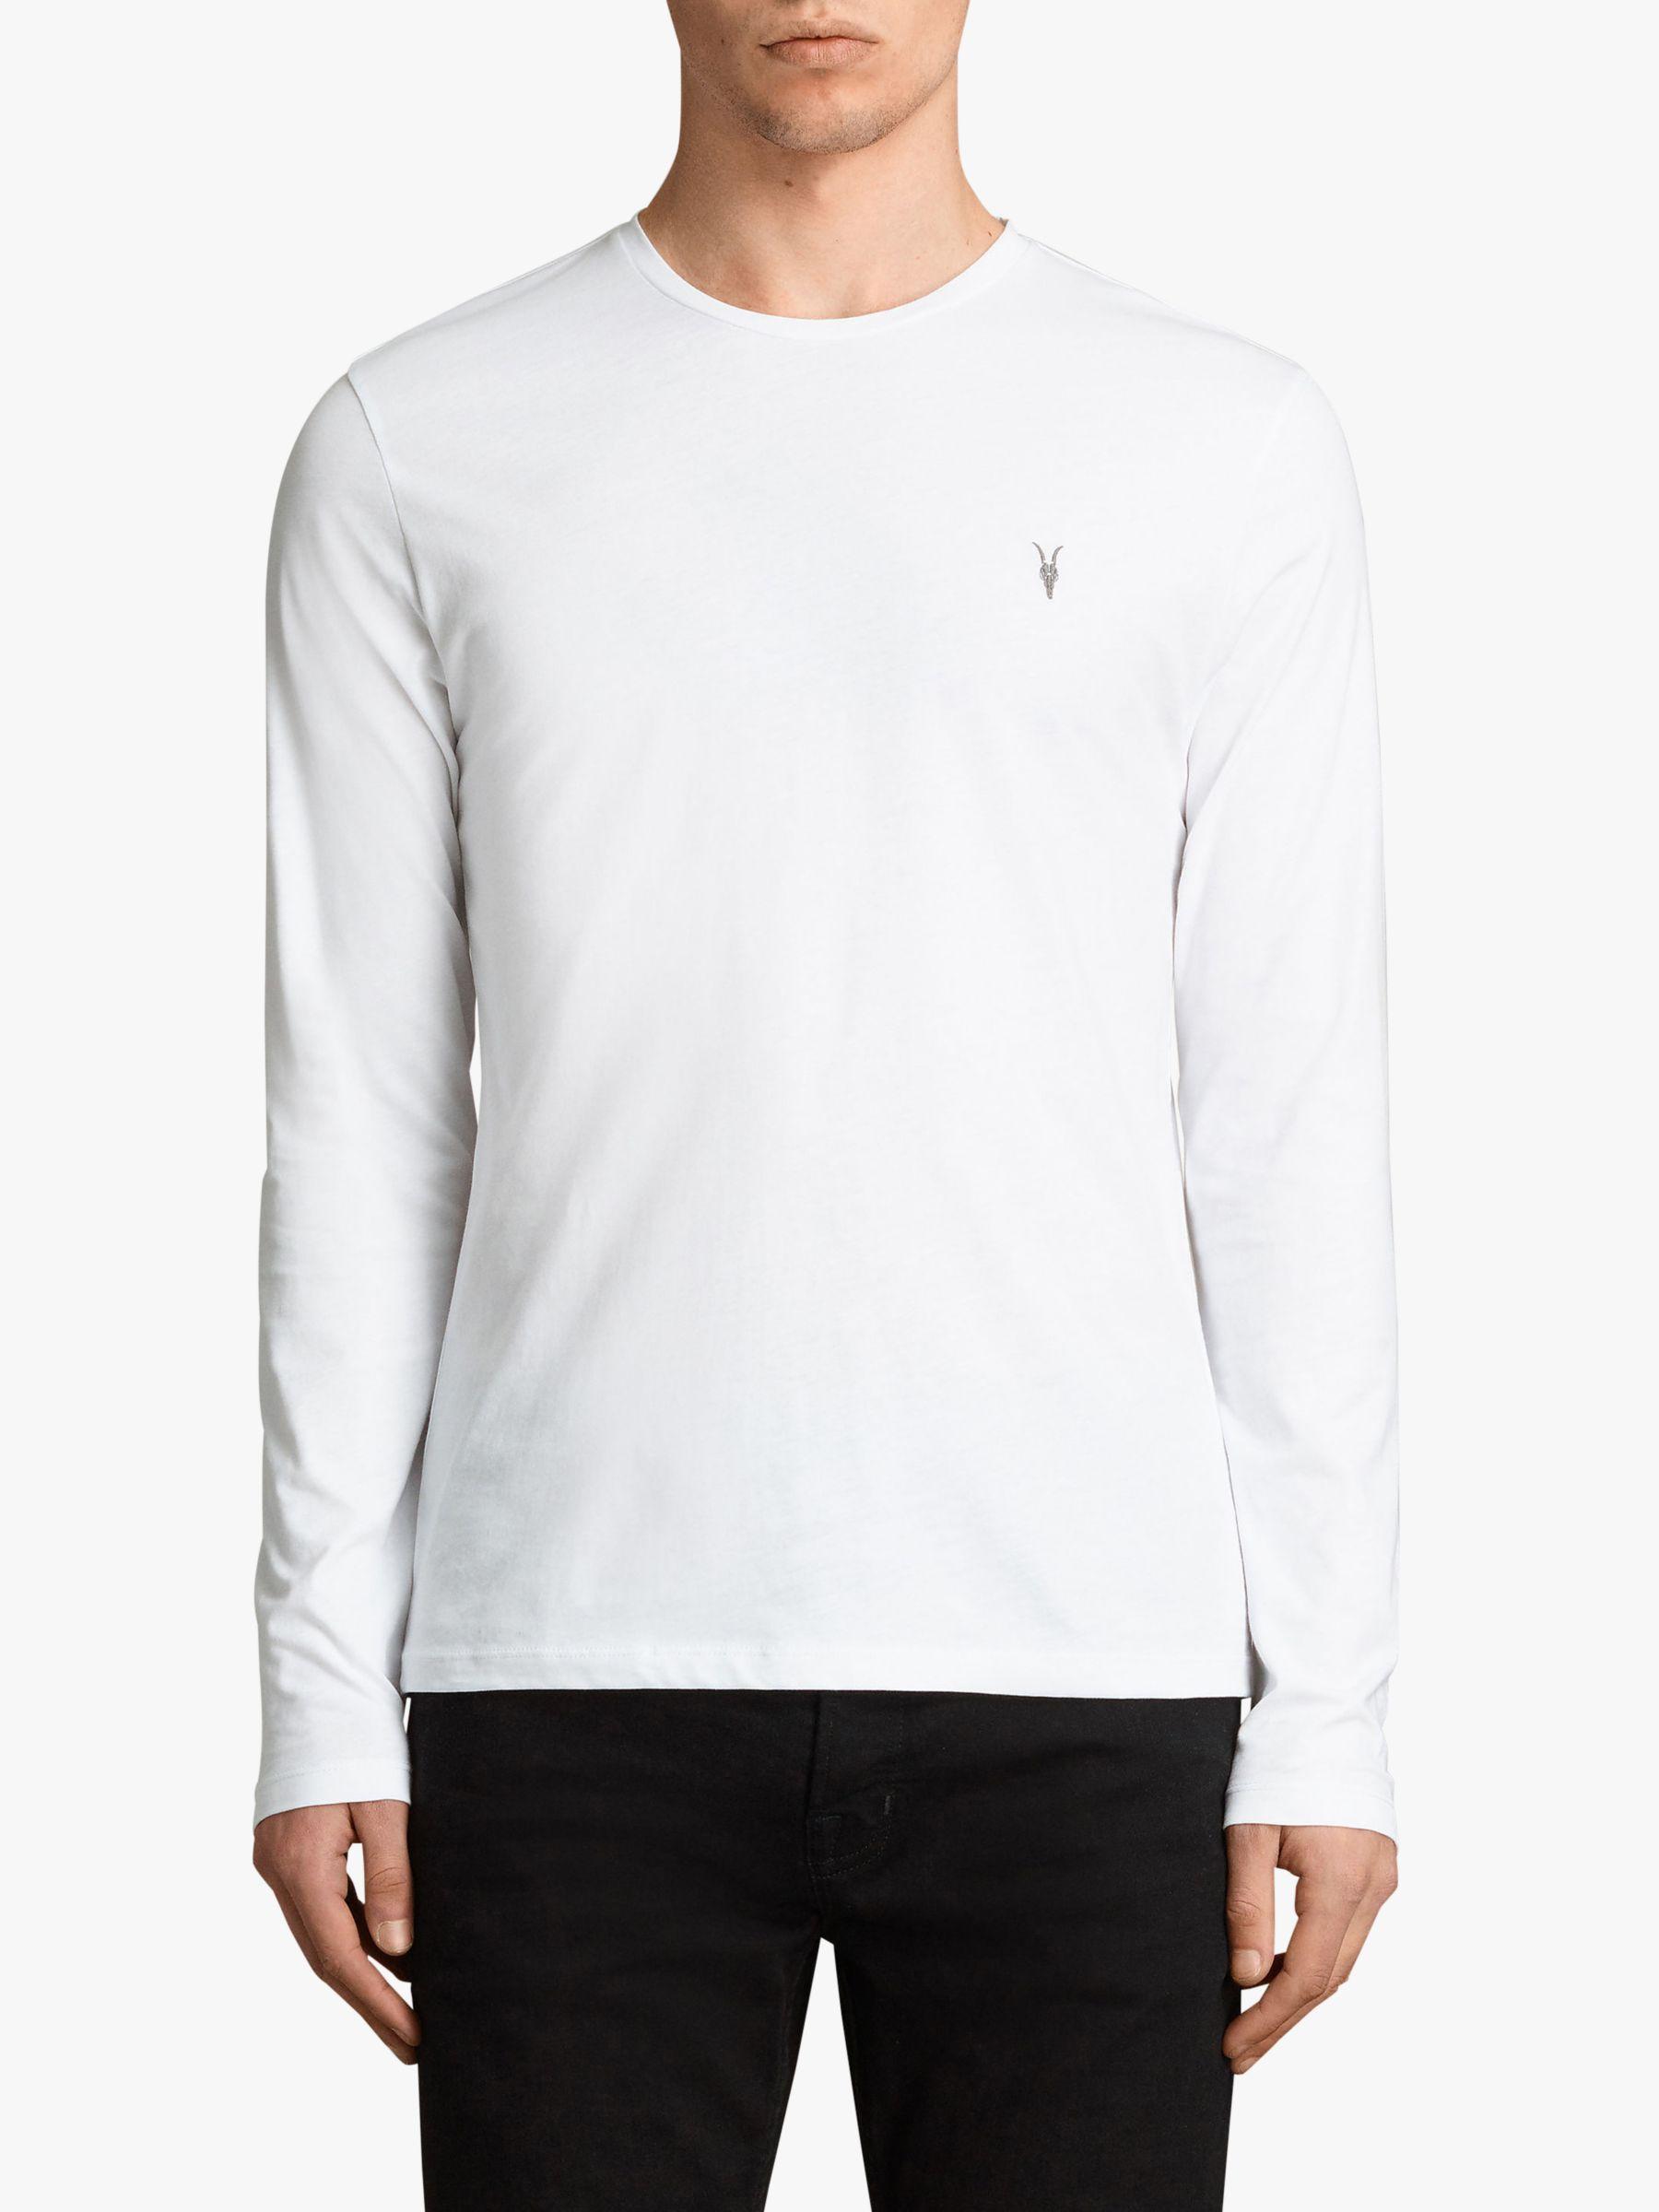 ee7eb16ab AllSaints Brace Long Sleeve Crew T-shirt for Men - Lyst